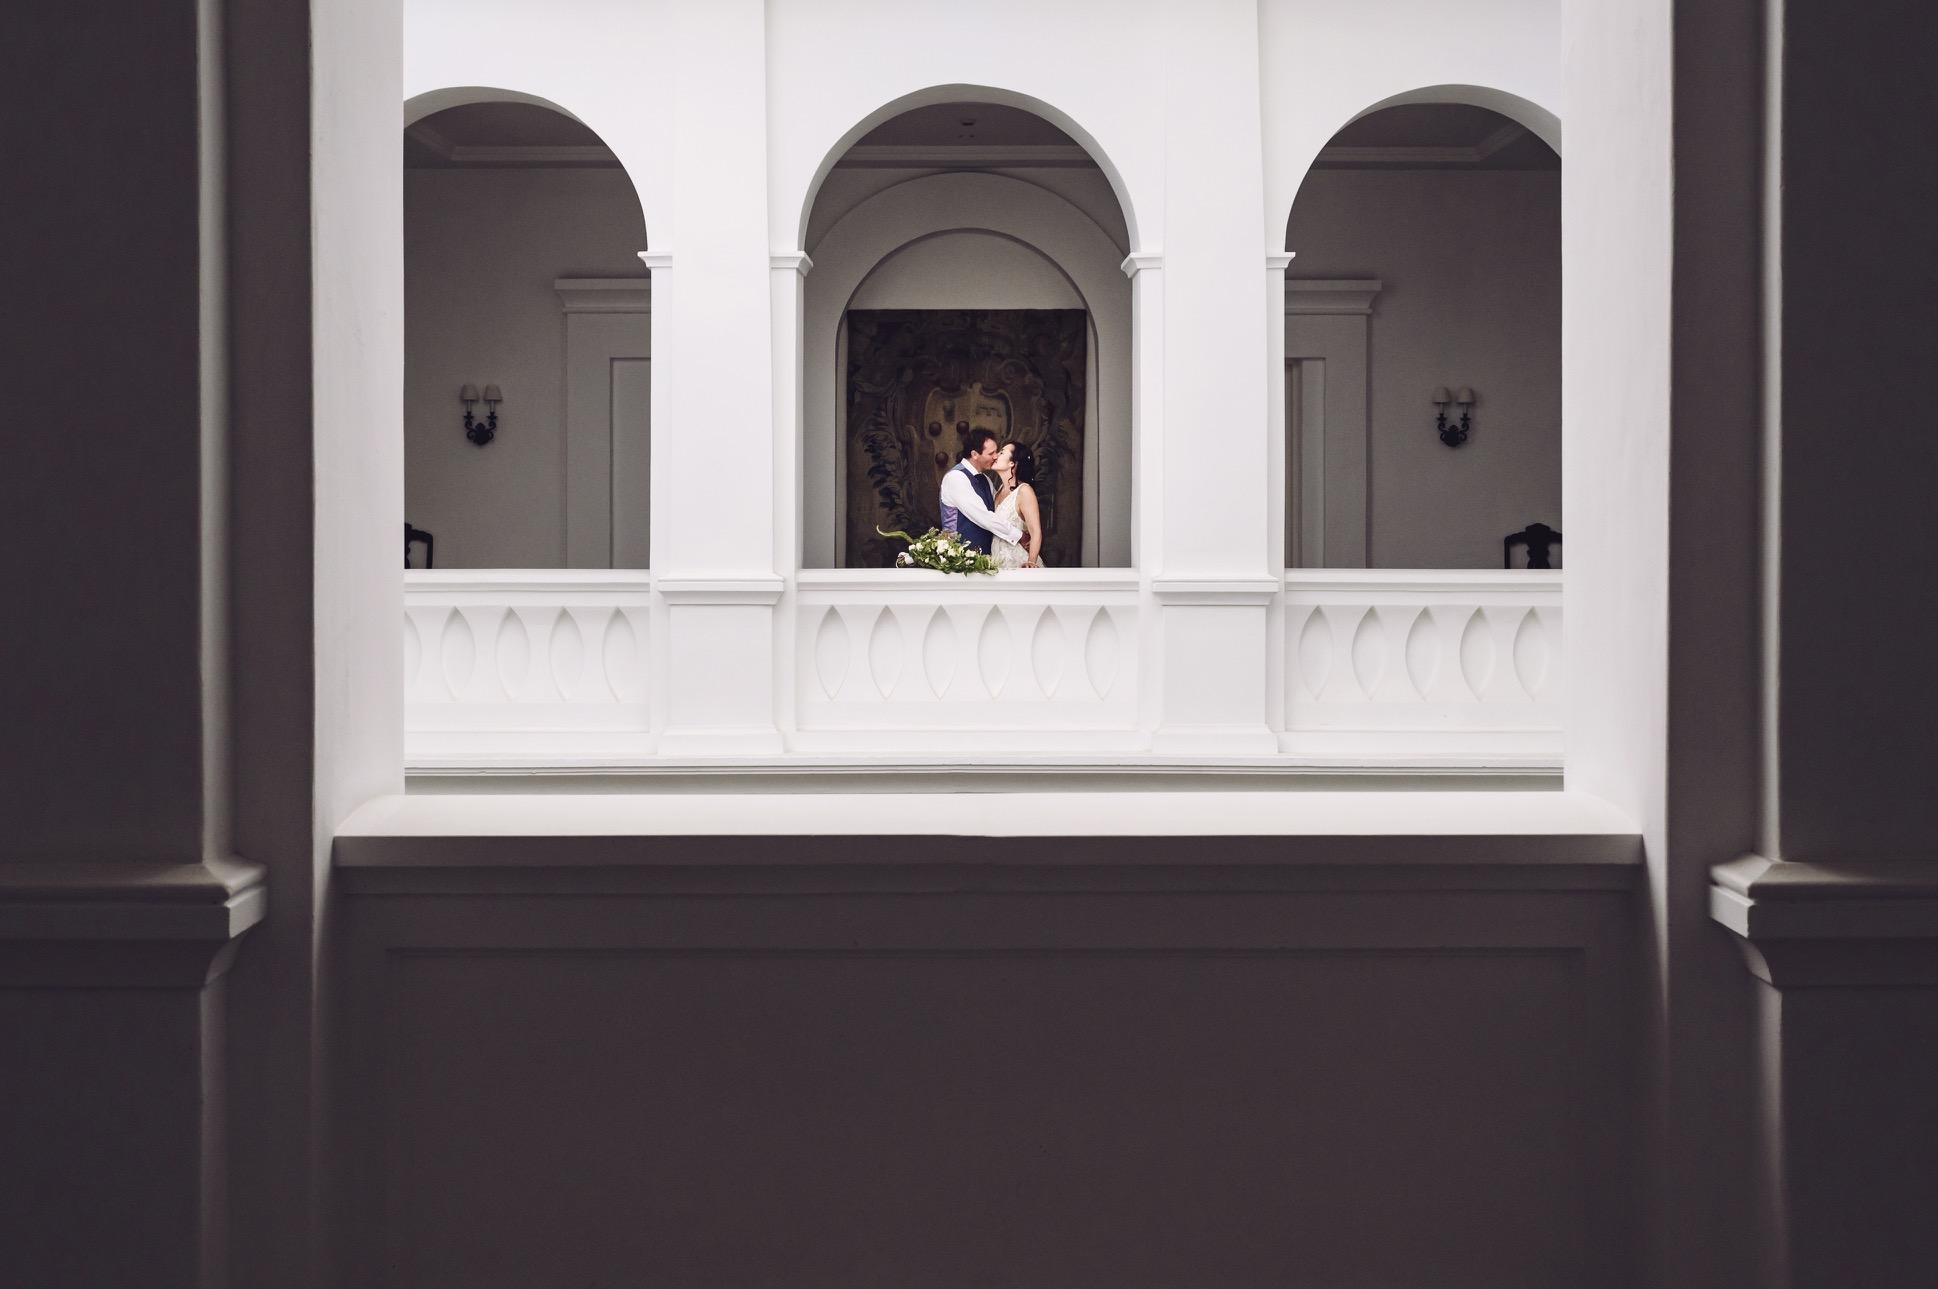 Si-Quiero-Wedding-Planner-By-Sira-Antequera-Bodas-Málaga-Marbella-Miami- Michelle-Walter-3